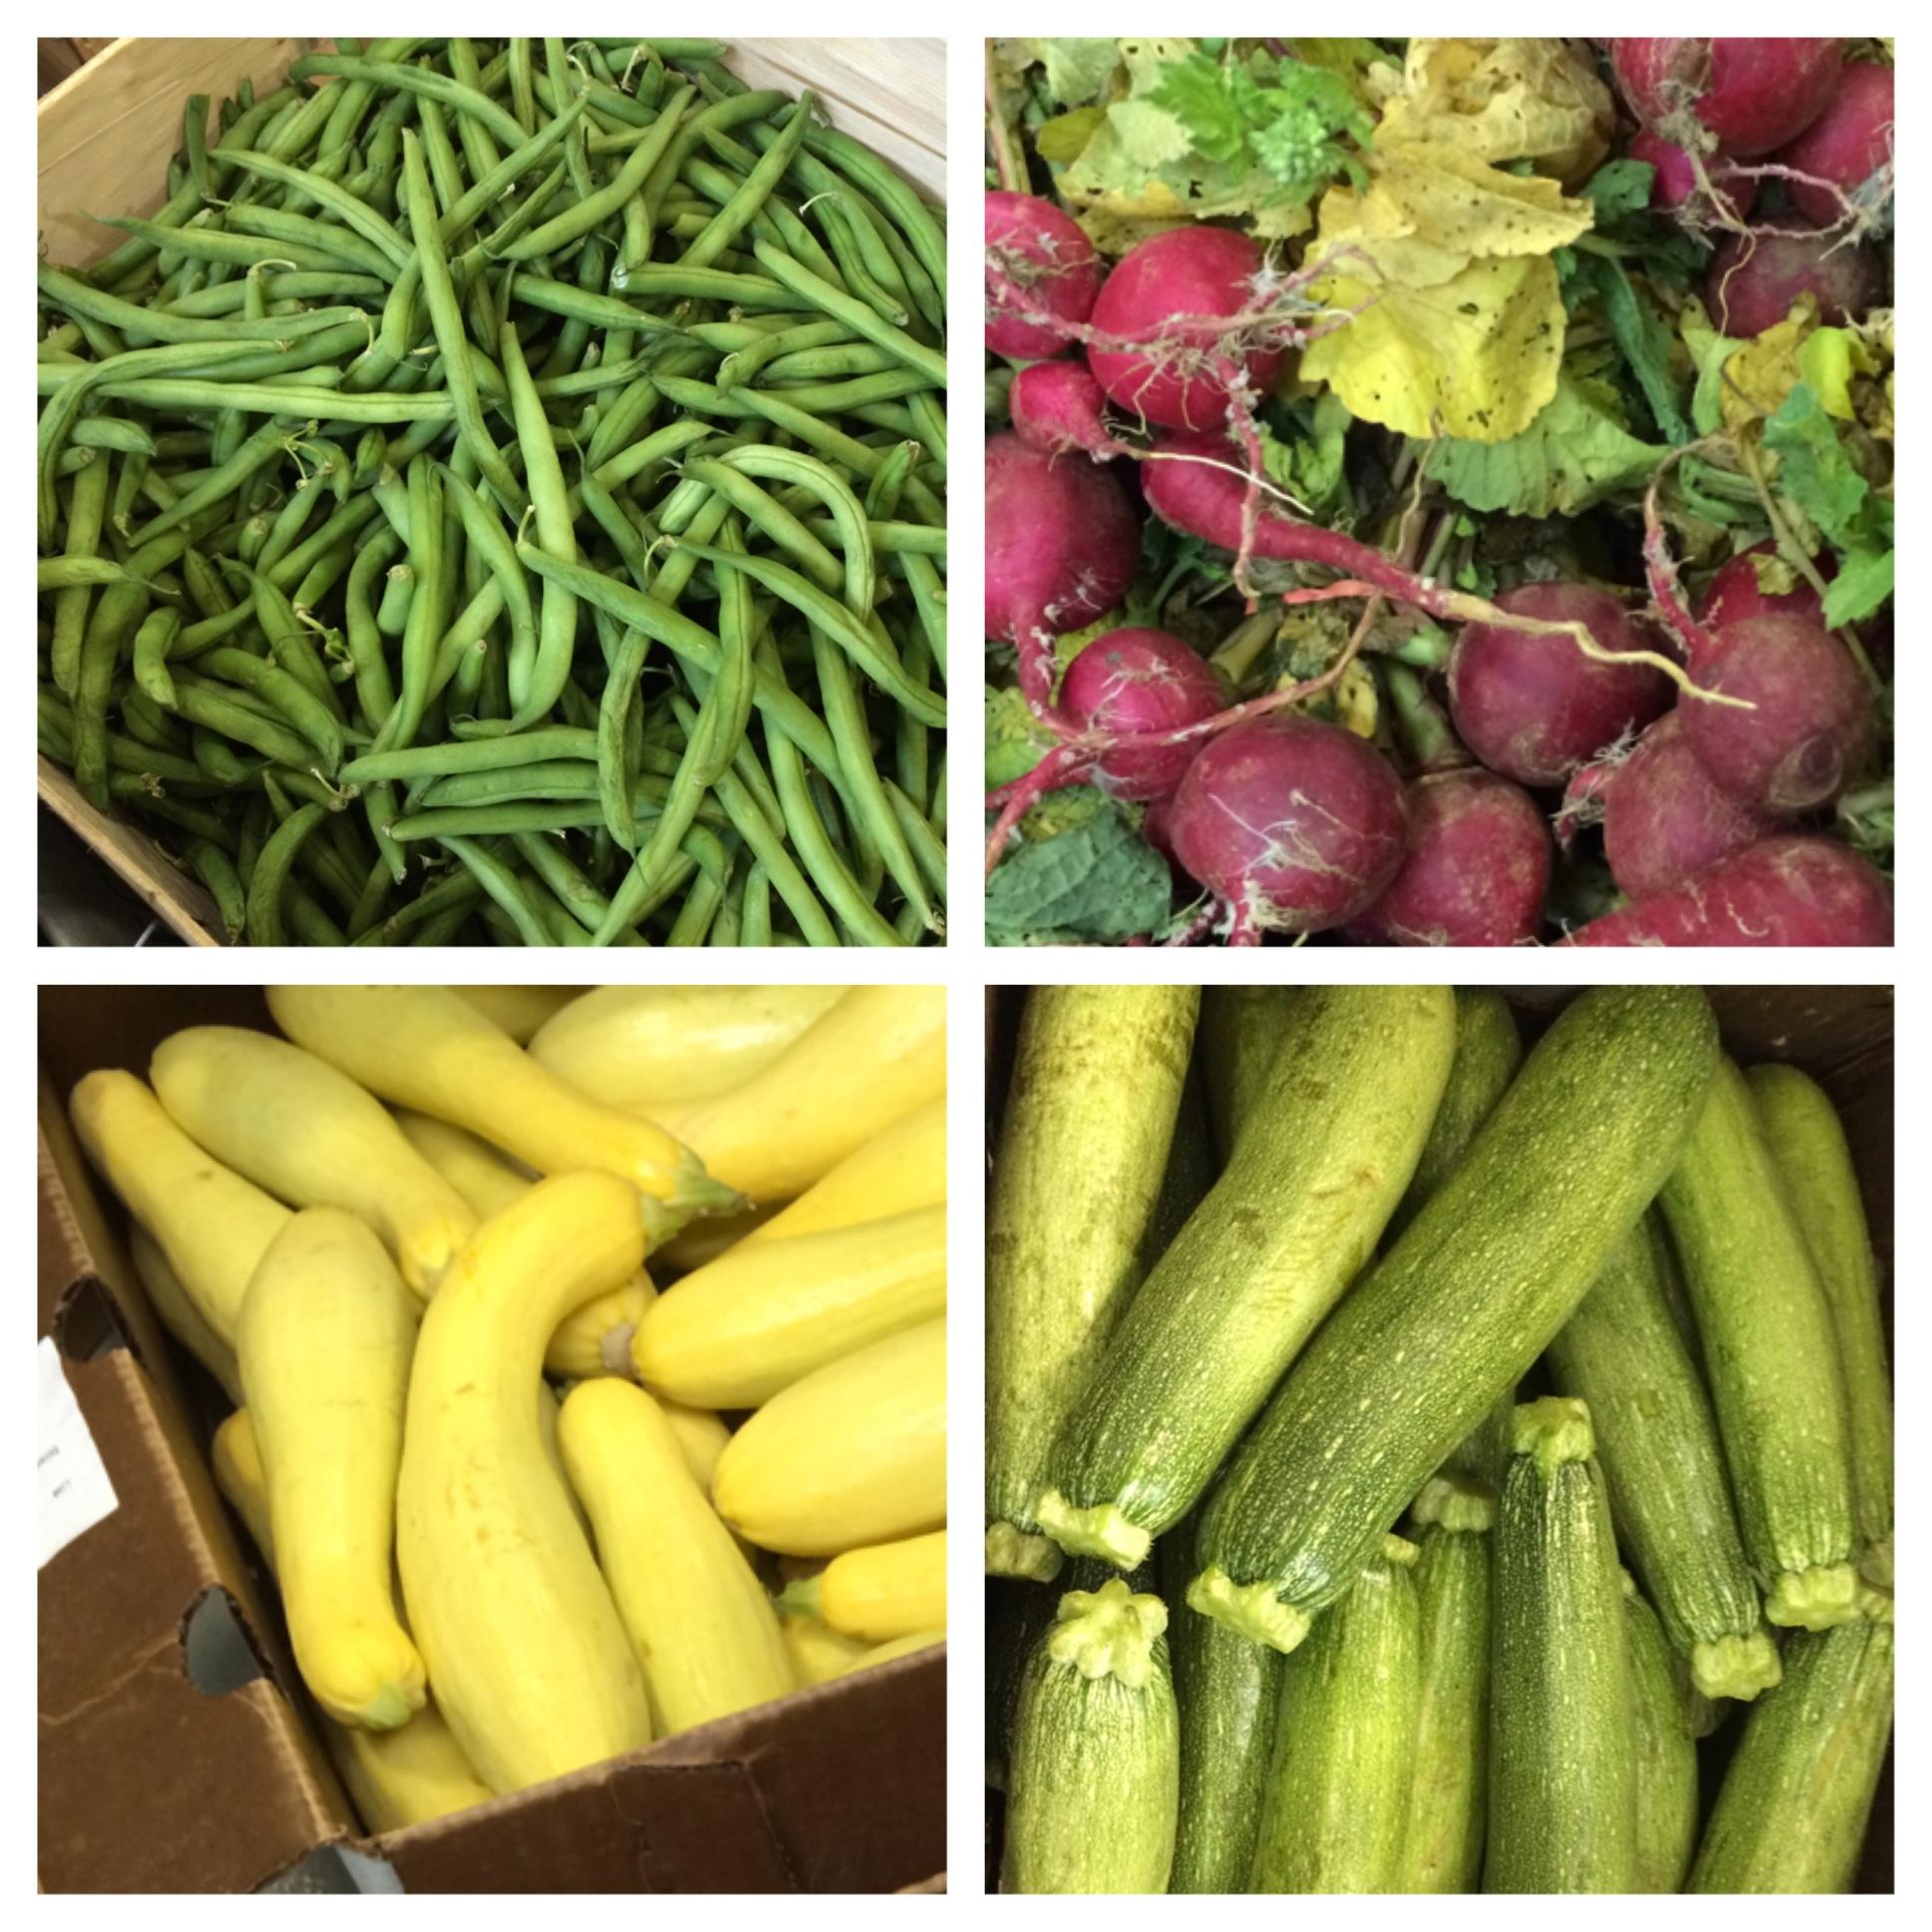 CSA program provides fresh, local produce